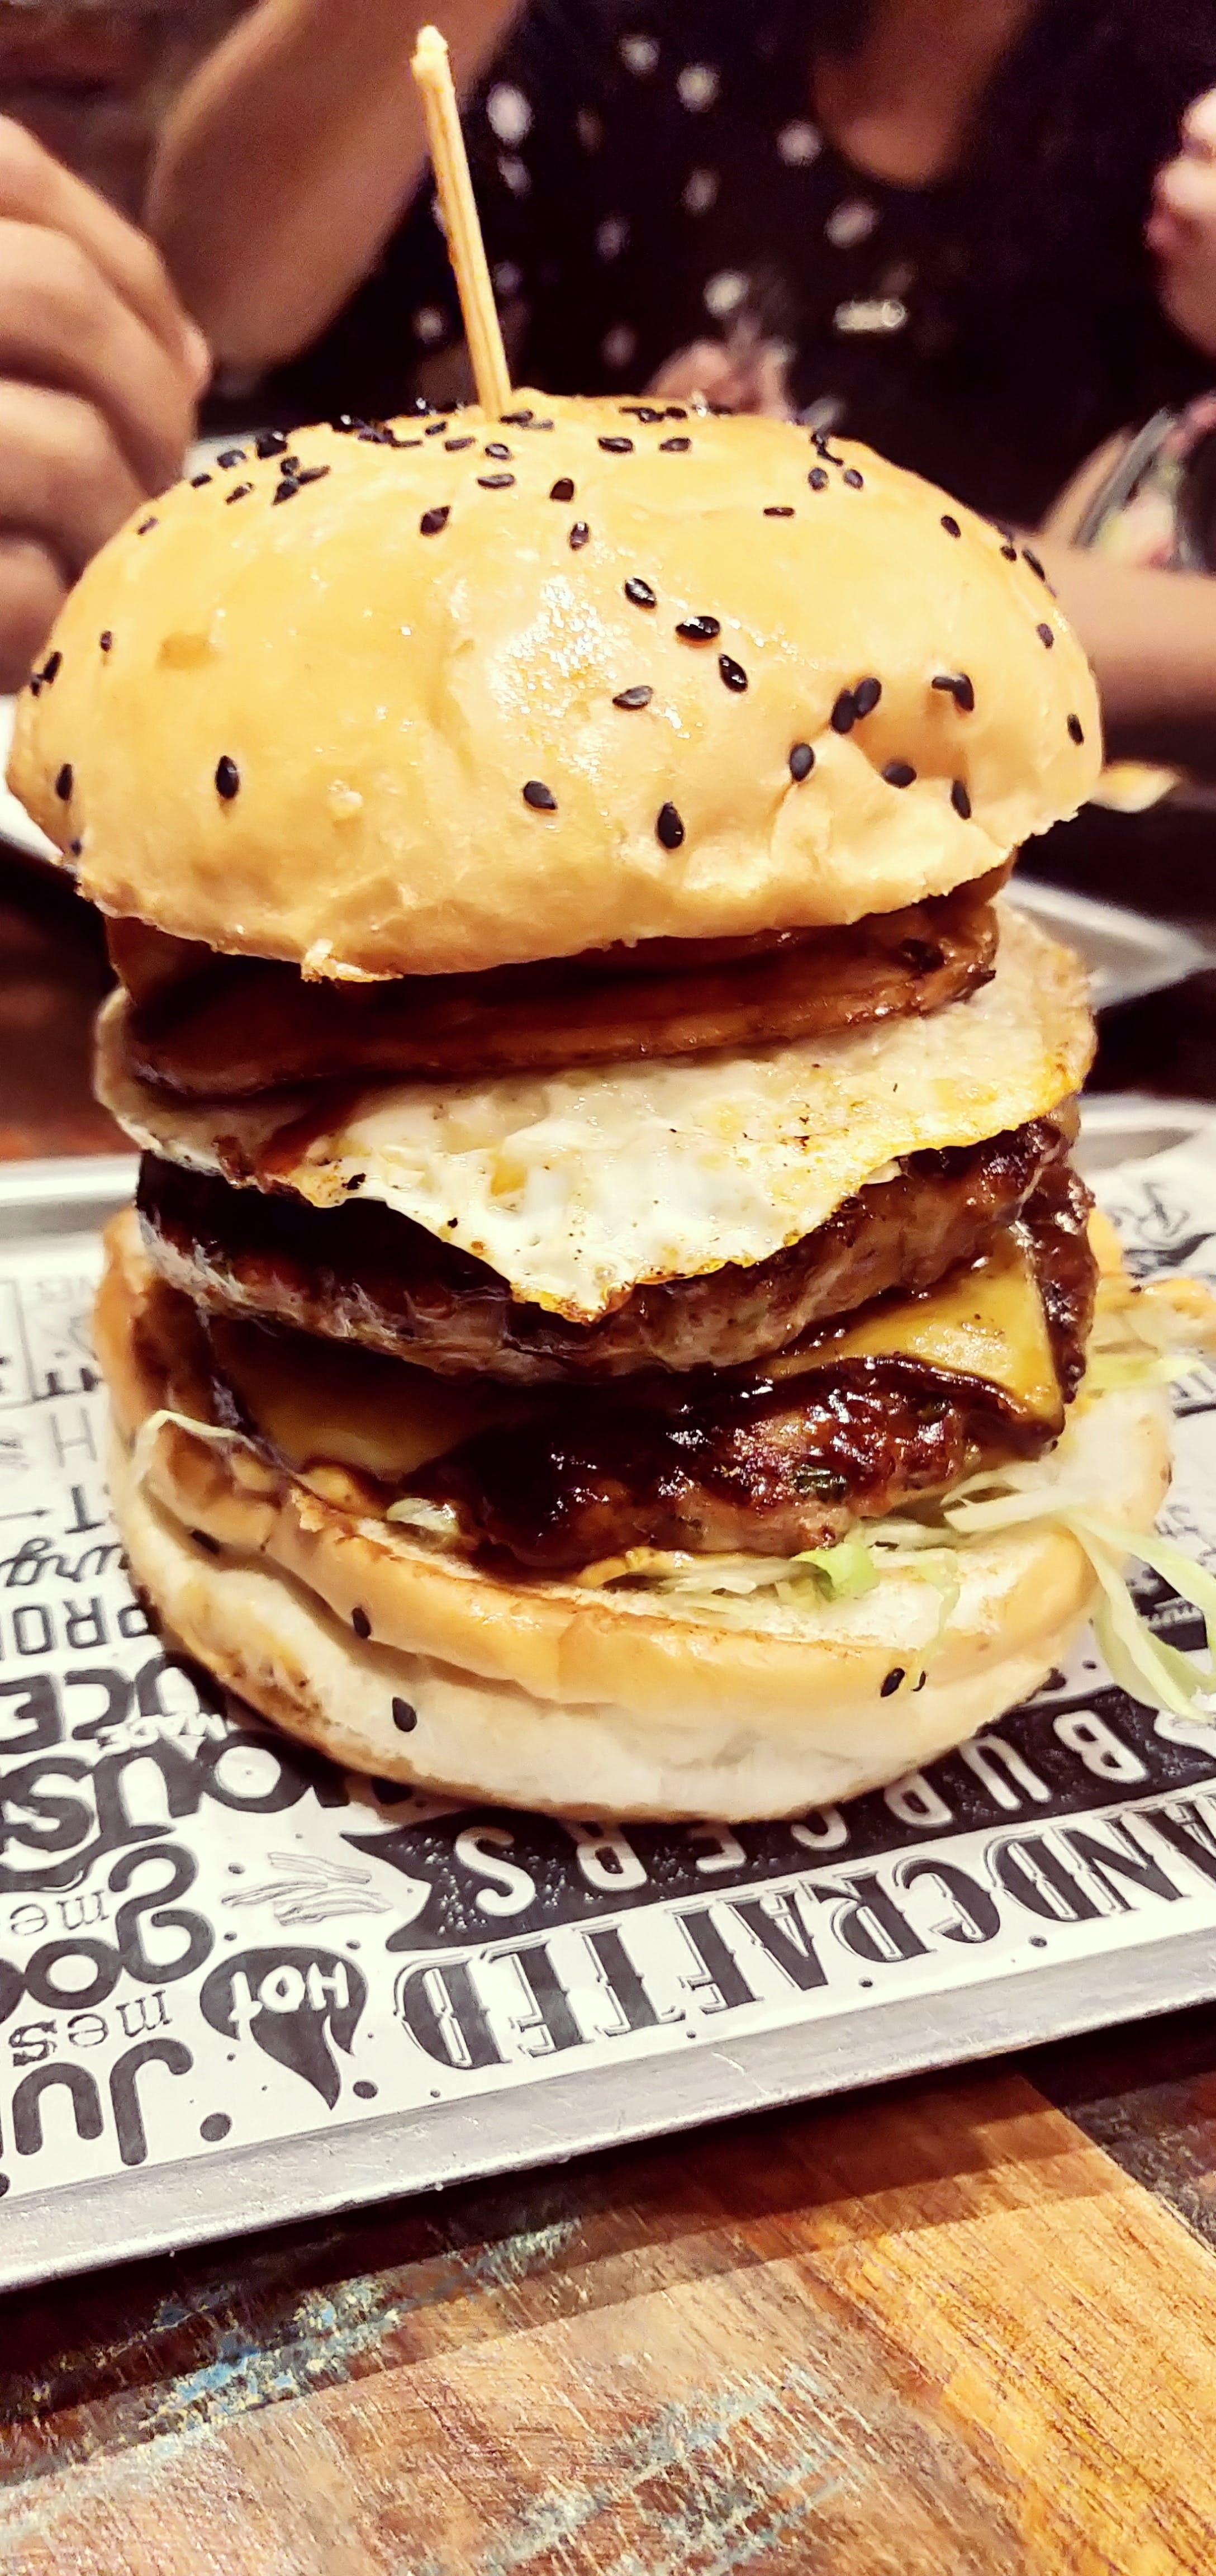 Free stock photo of burger, cheese, cheeseburger, city